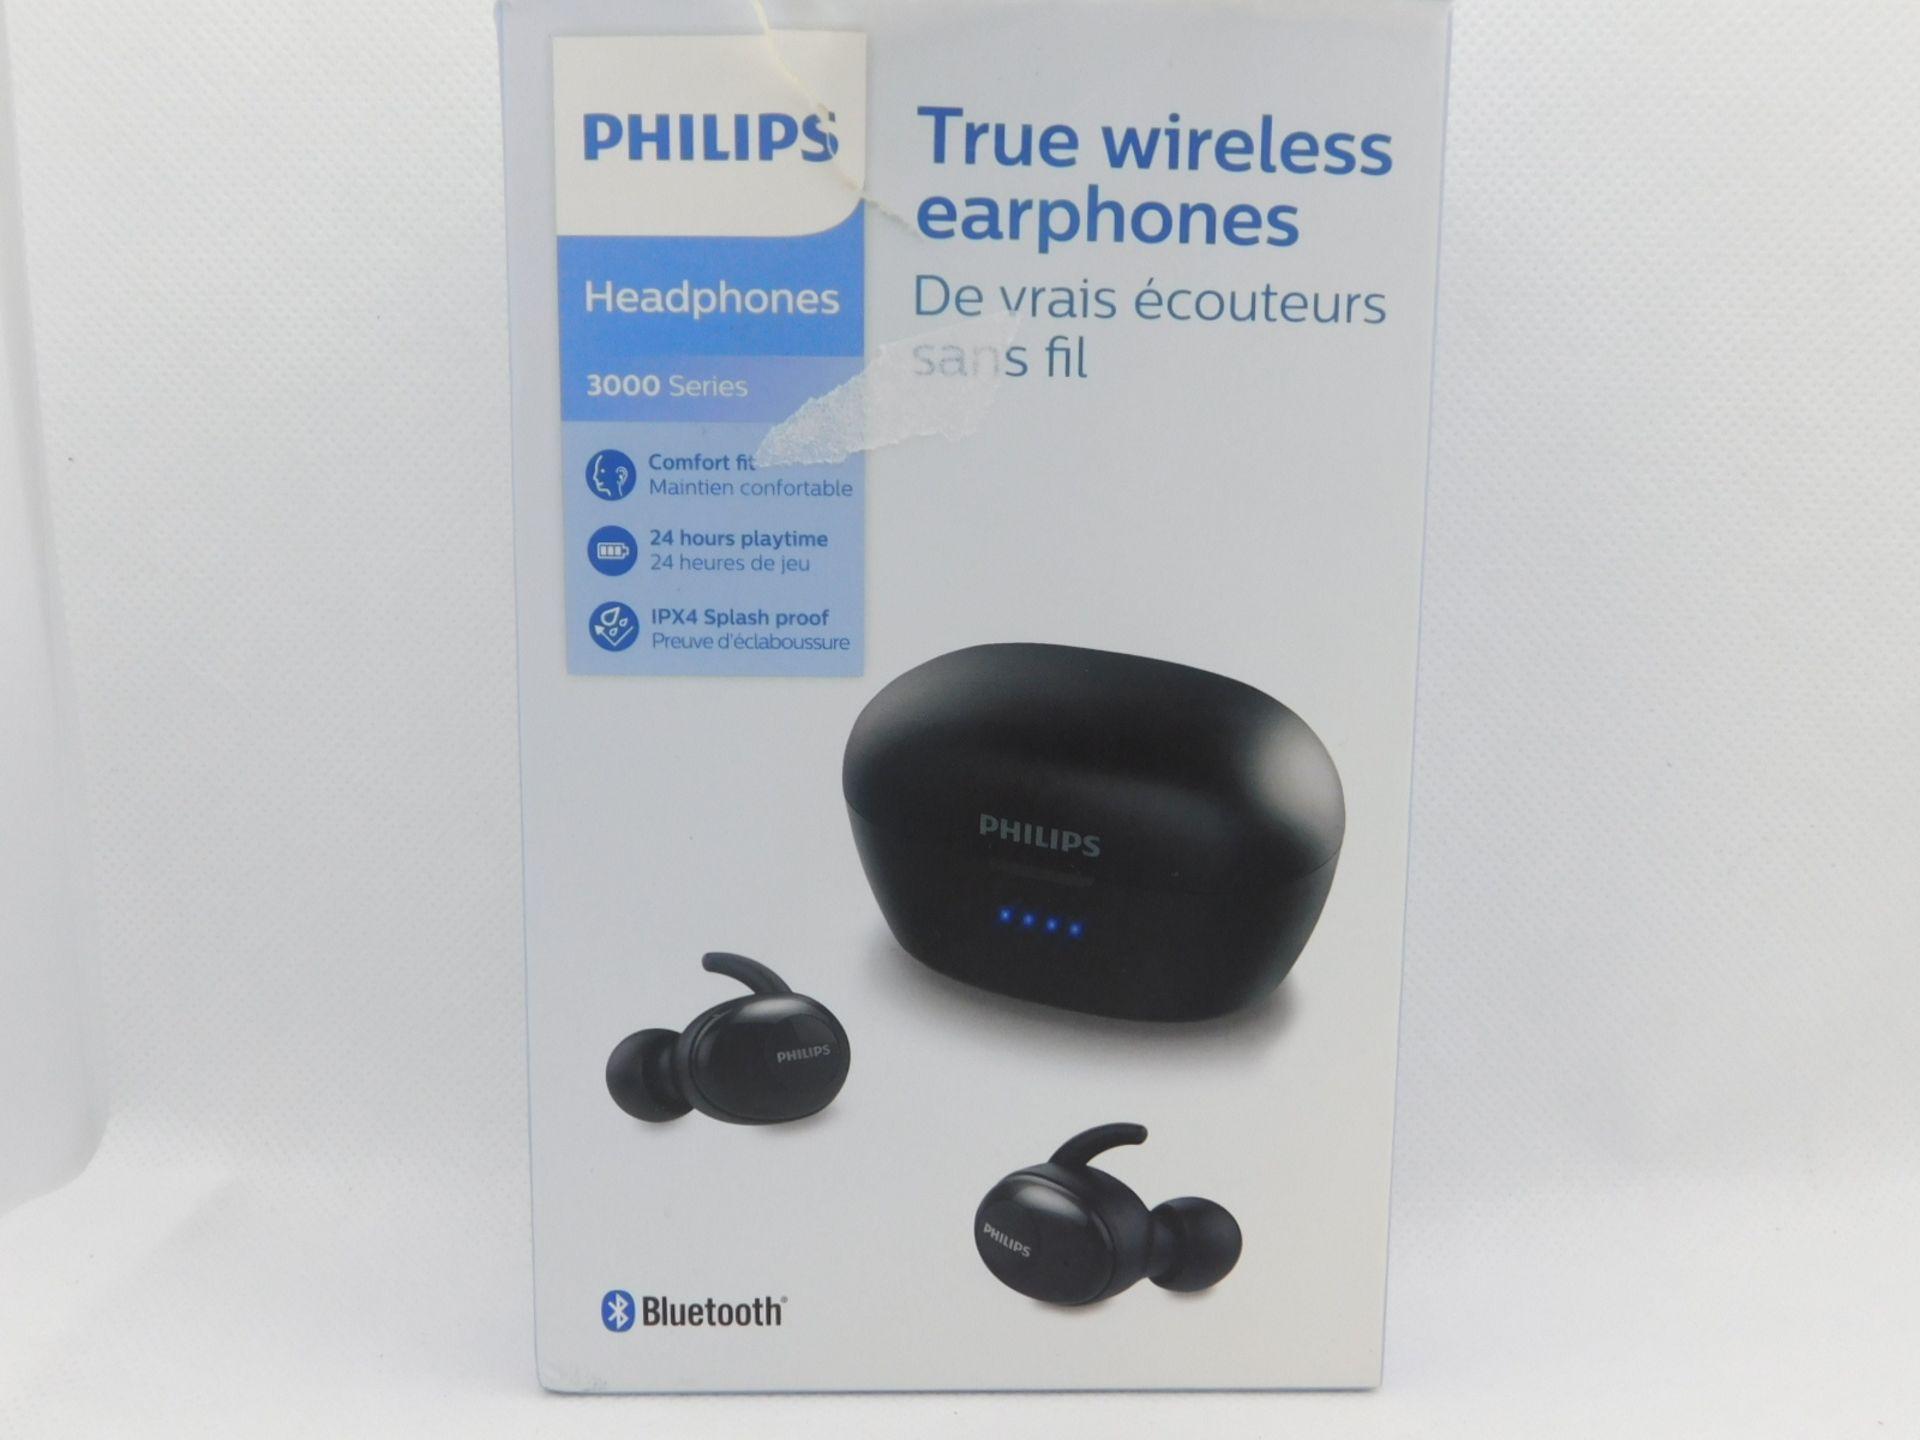 1 BOXED PHILIPS TRUE WIRELESS EARPHONES 3000 SERIES RRP £79.99